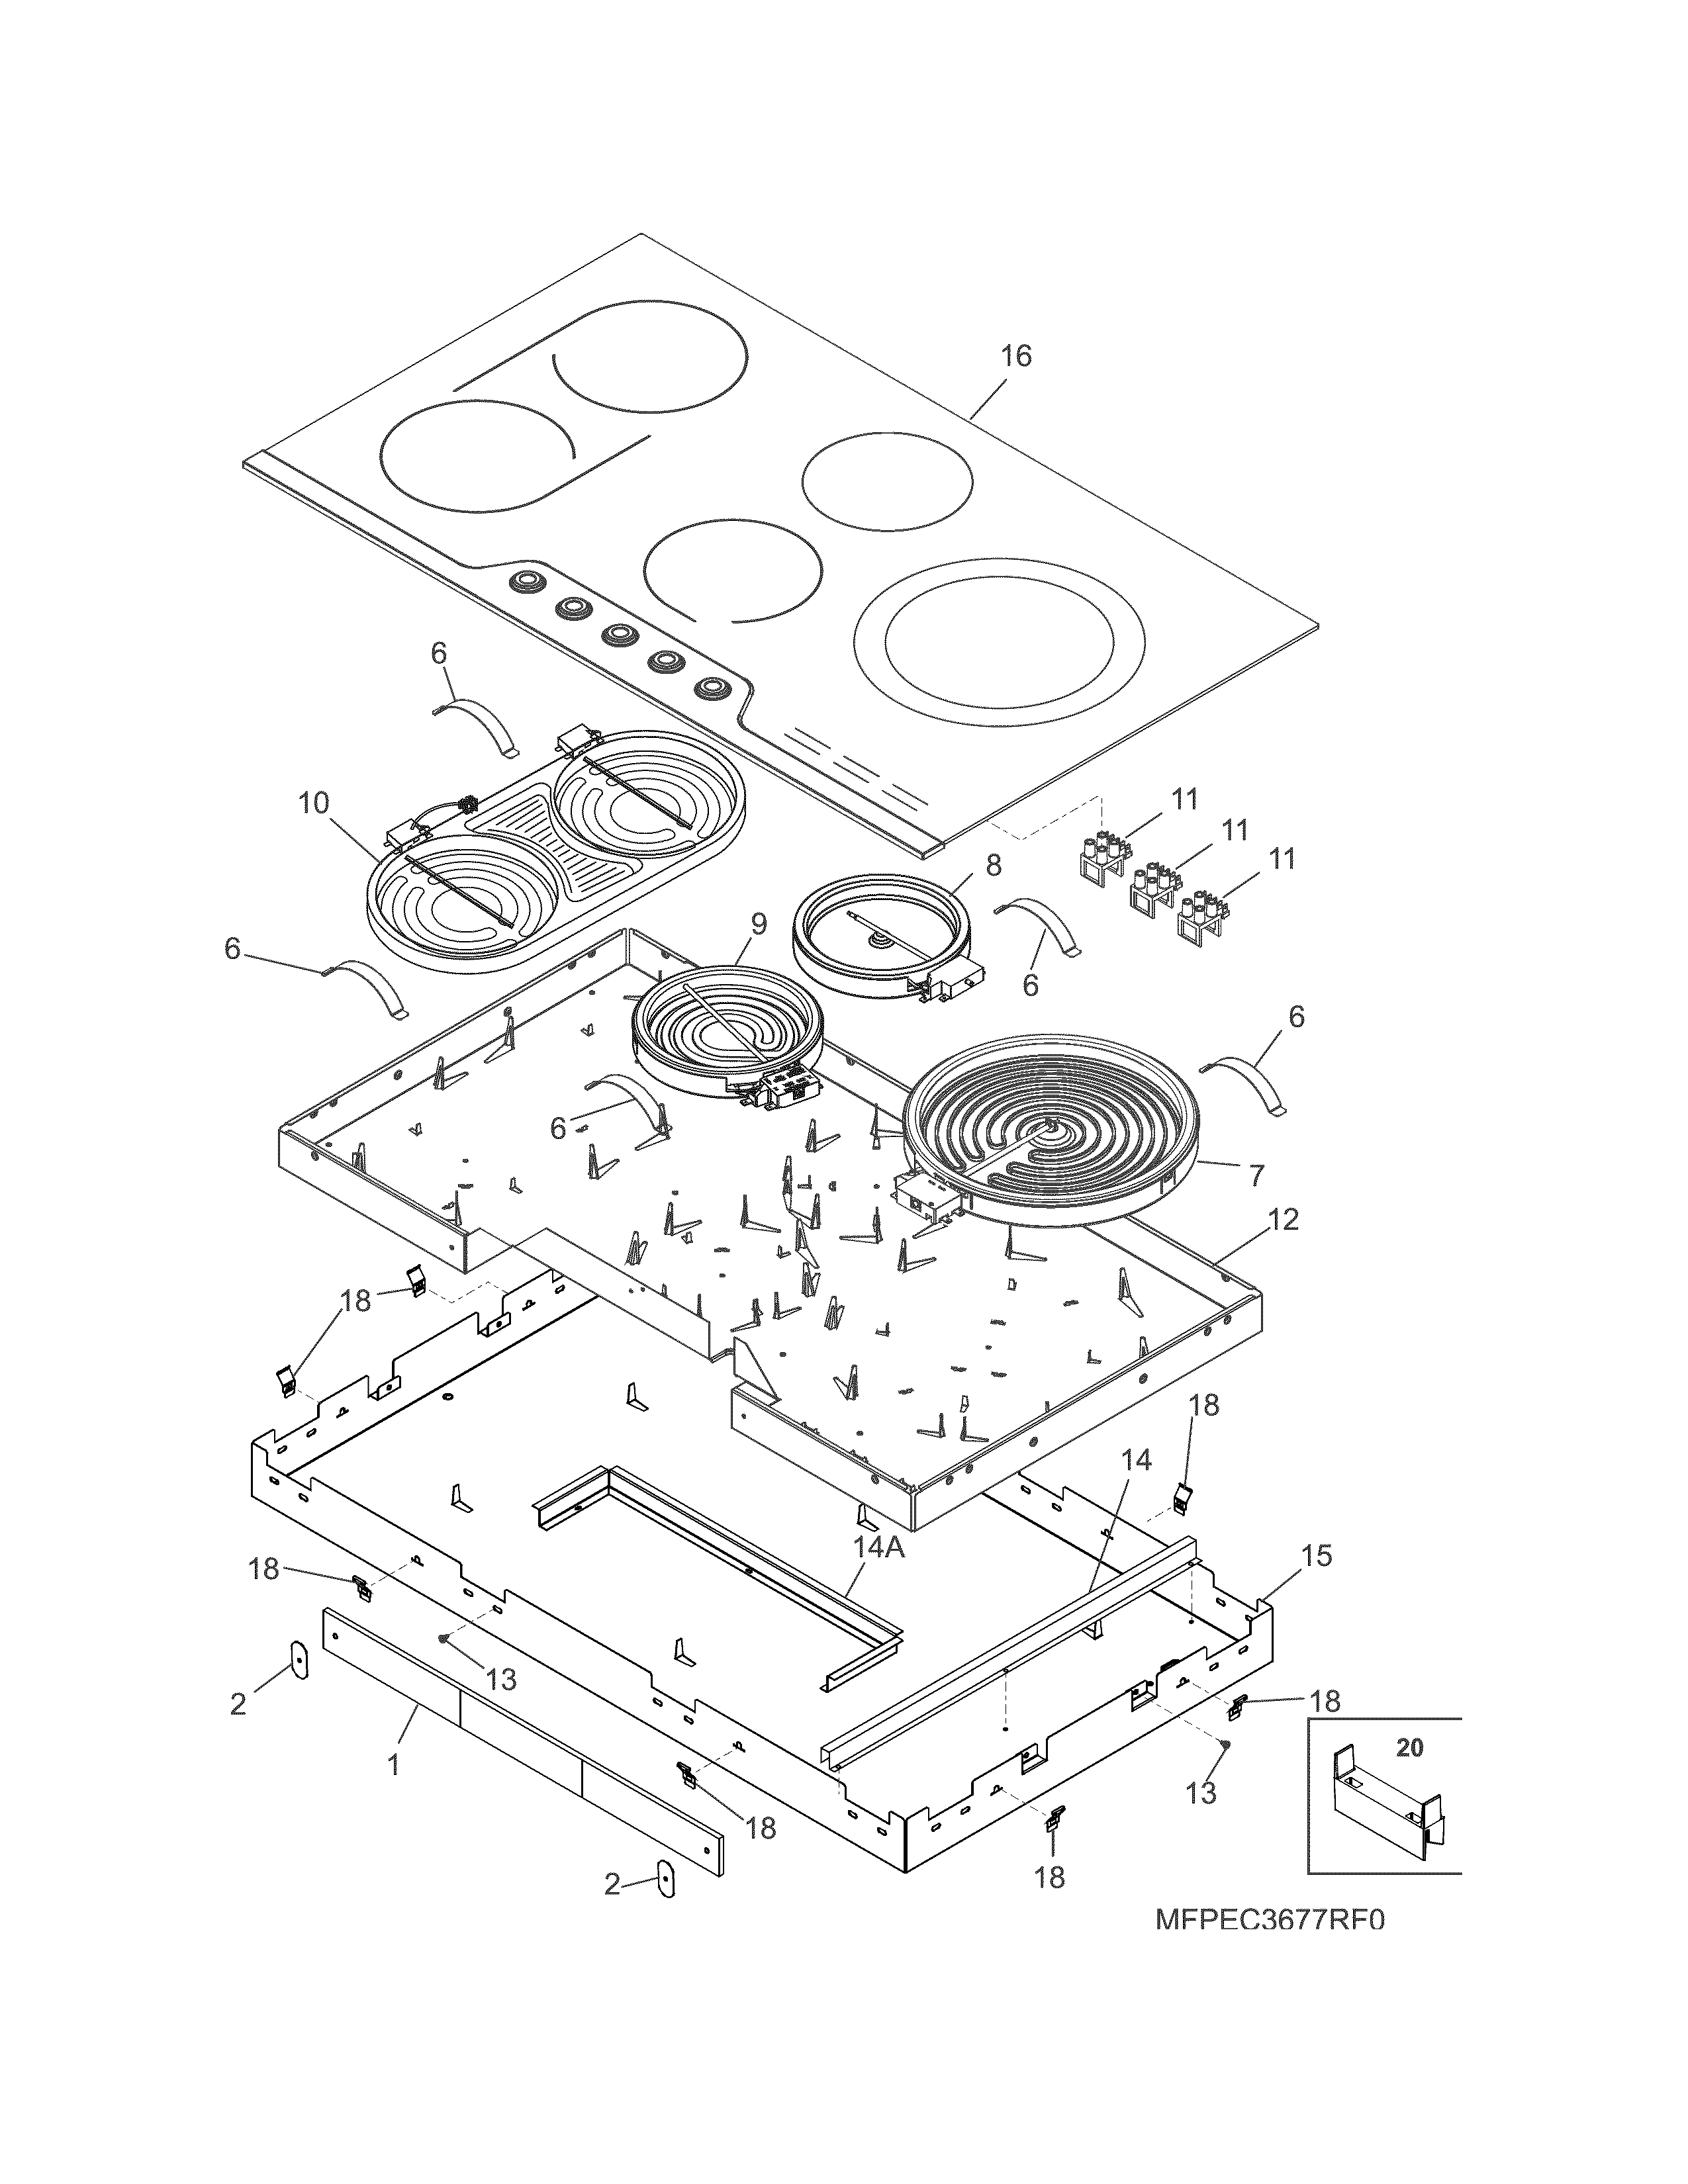 Frigidaire  Cooktop  Main top/surface units